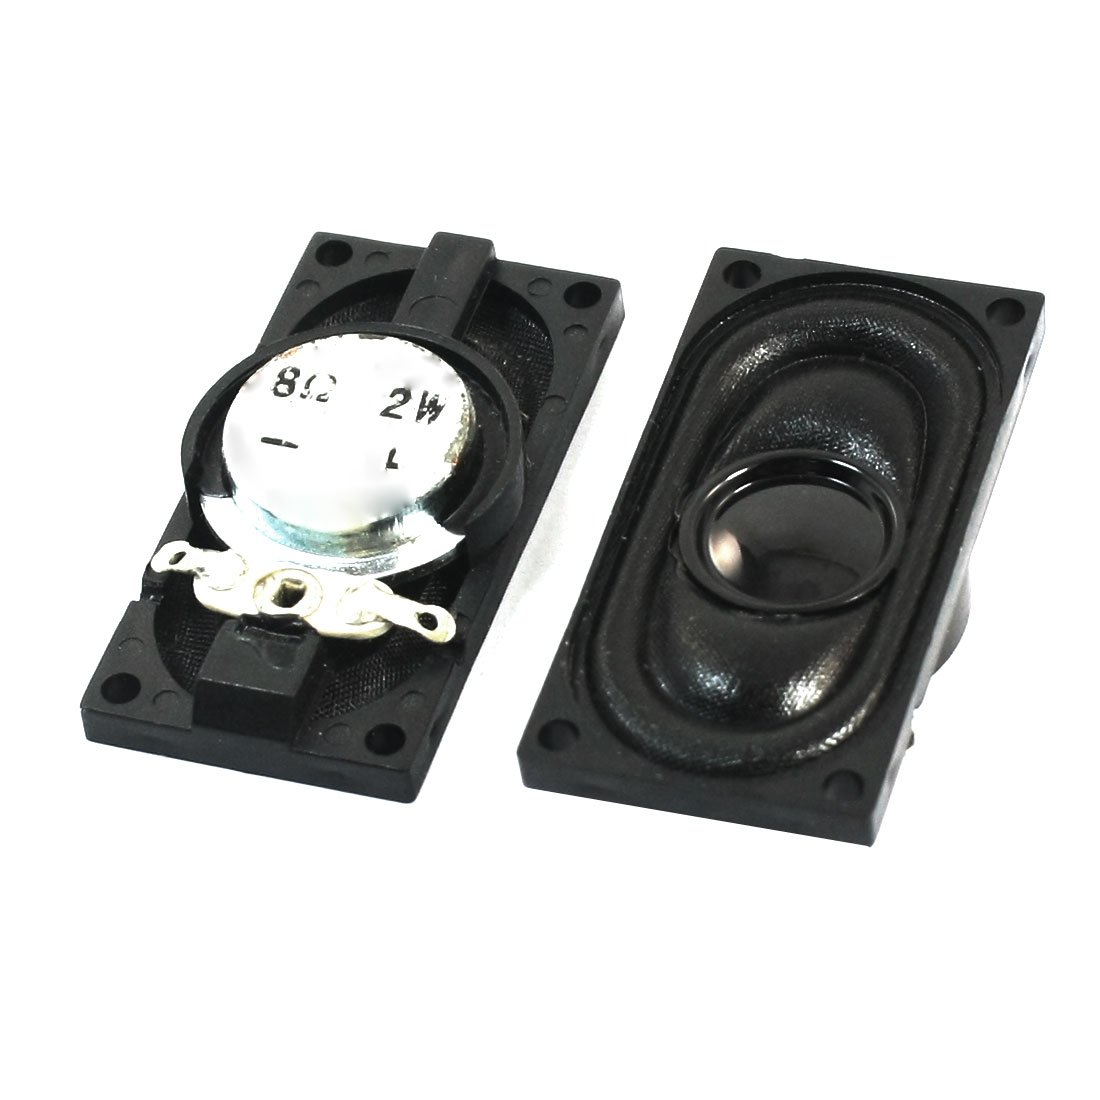 uxcell 0.5W 8 Ohm Audio Speaker Diameter 20mm Loudspeaker for Electronic Project 4pcs